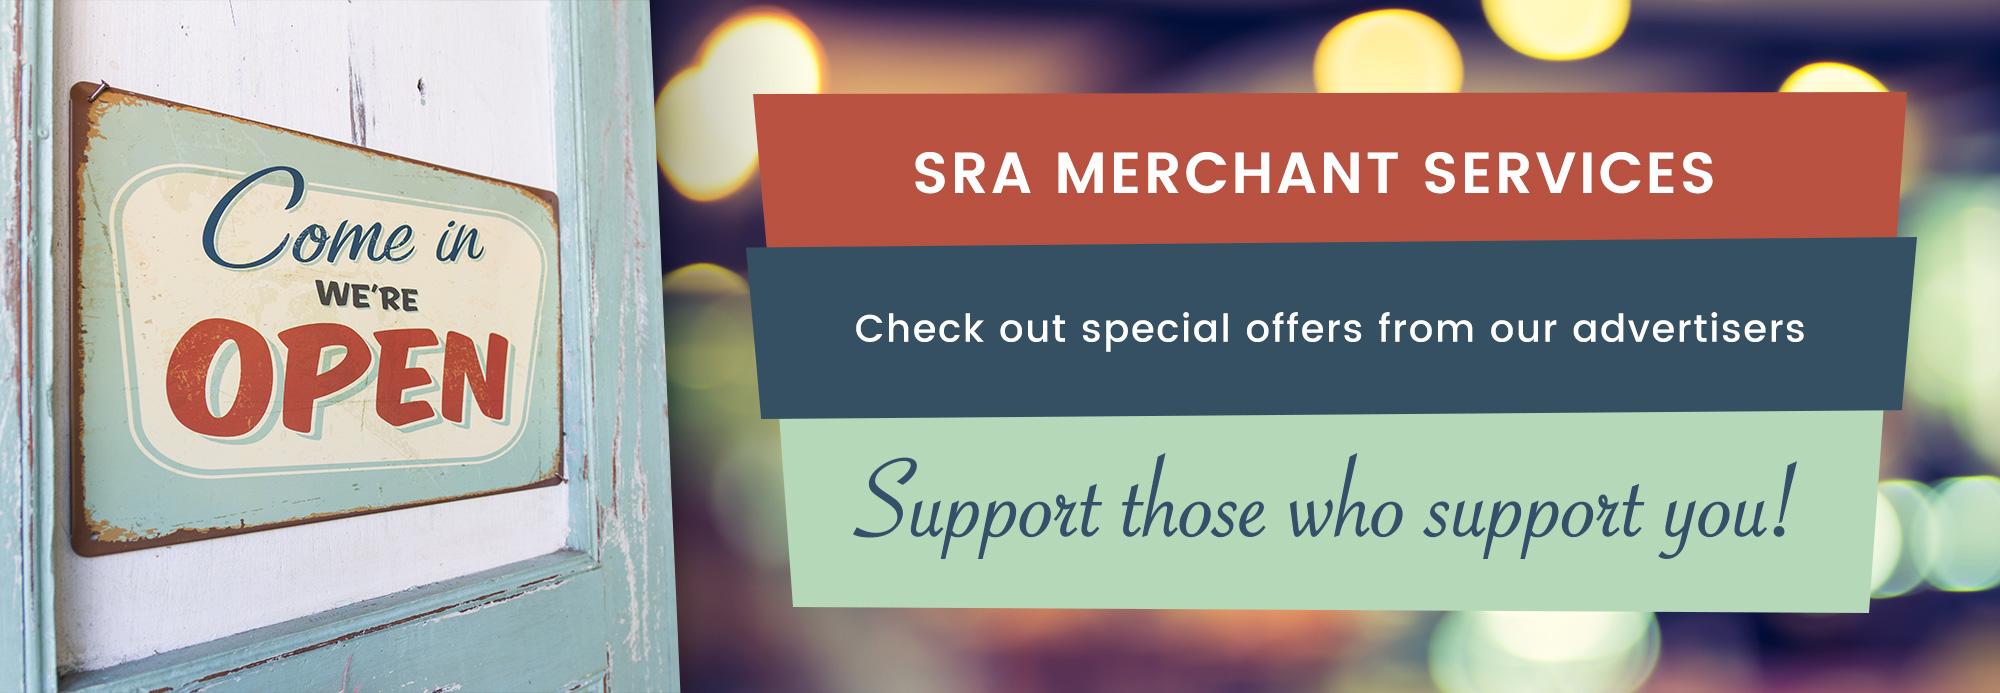 SRA Merchant Services